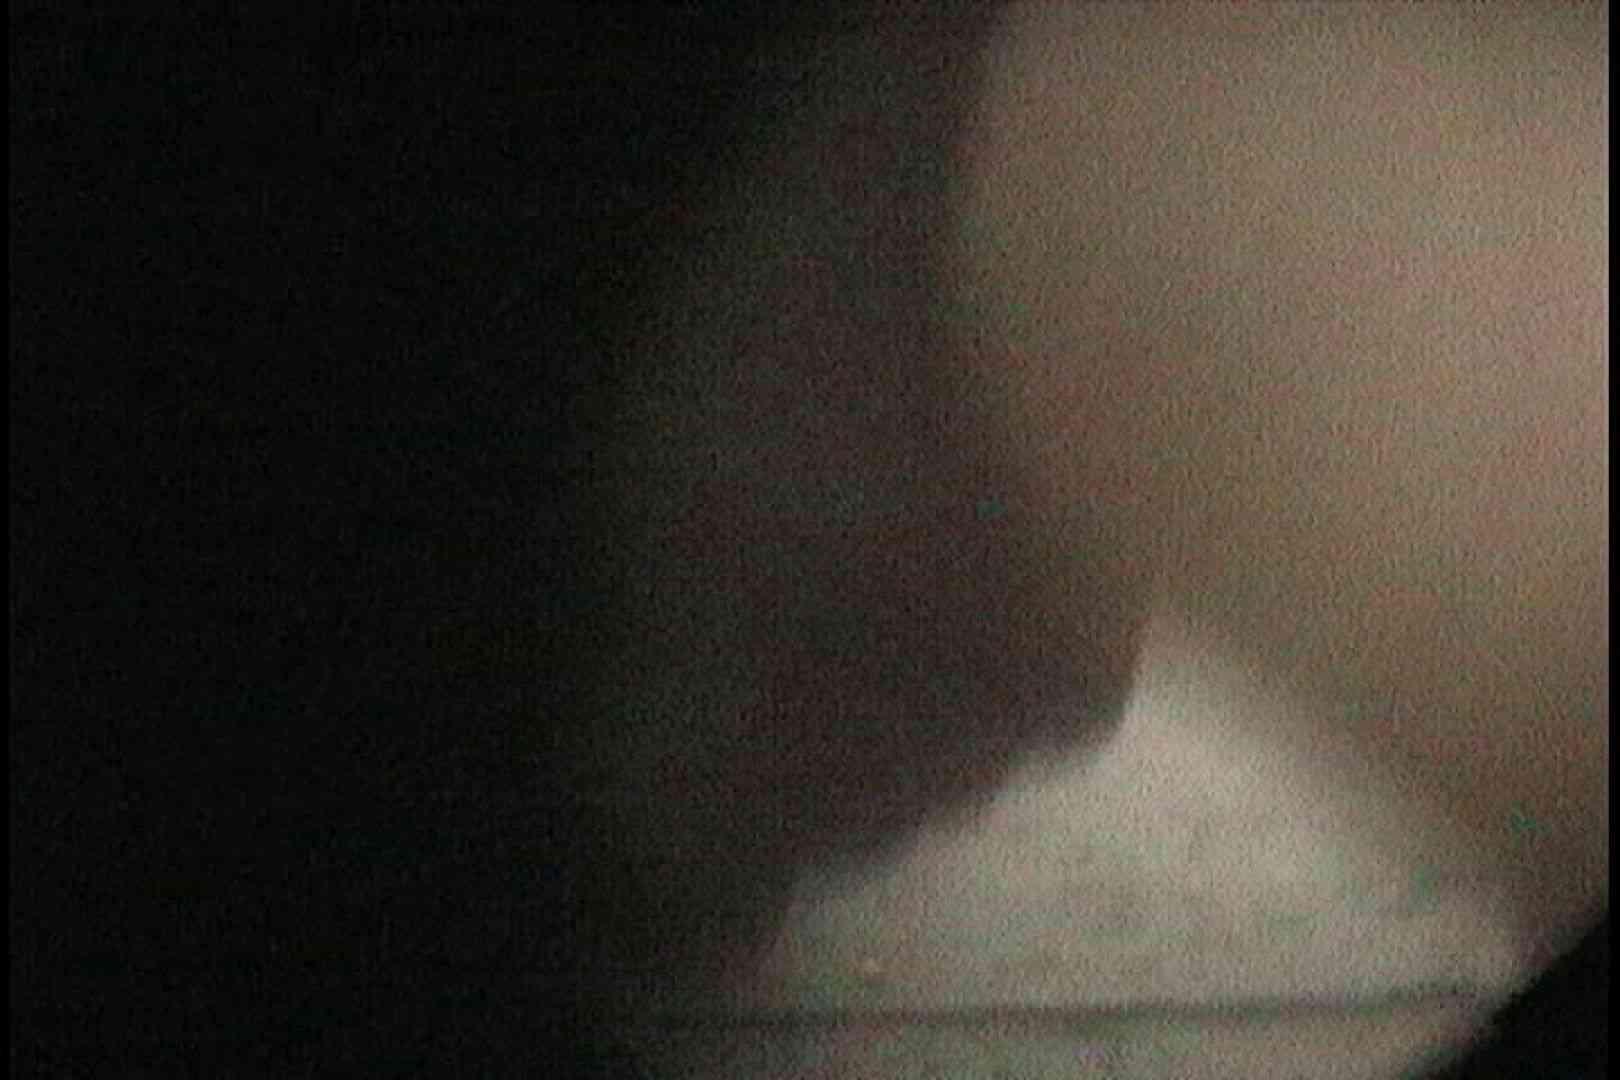 No.68 見事に可愛い巨乳ちゃん 室内暗いです 桃色乳首 おまんこ無修正動画無料 79枚 59